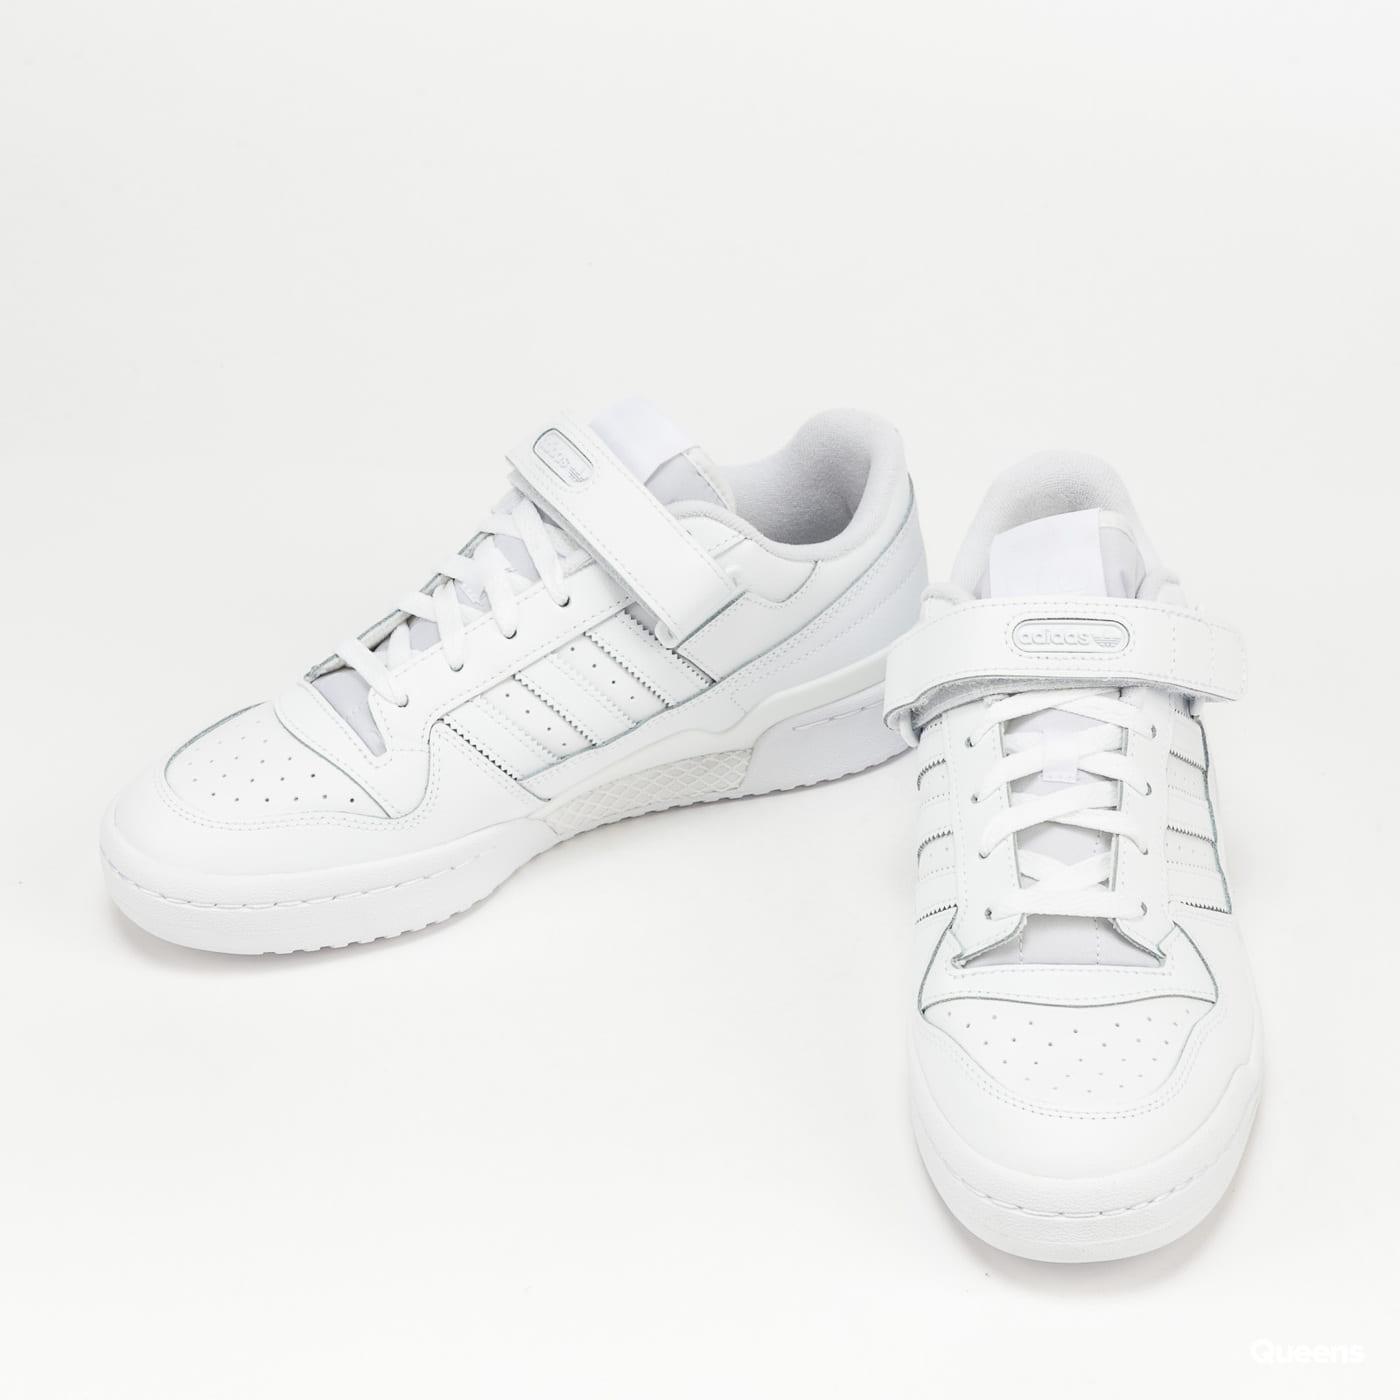 adidas Originals Forum Low ftwwht / ftwwht / ftwwht